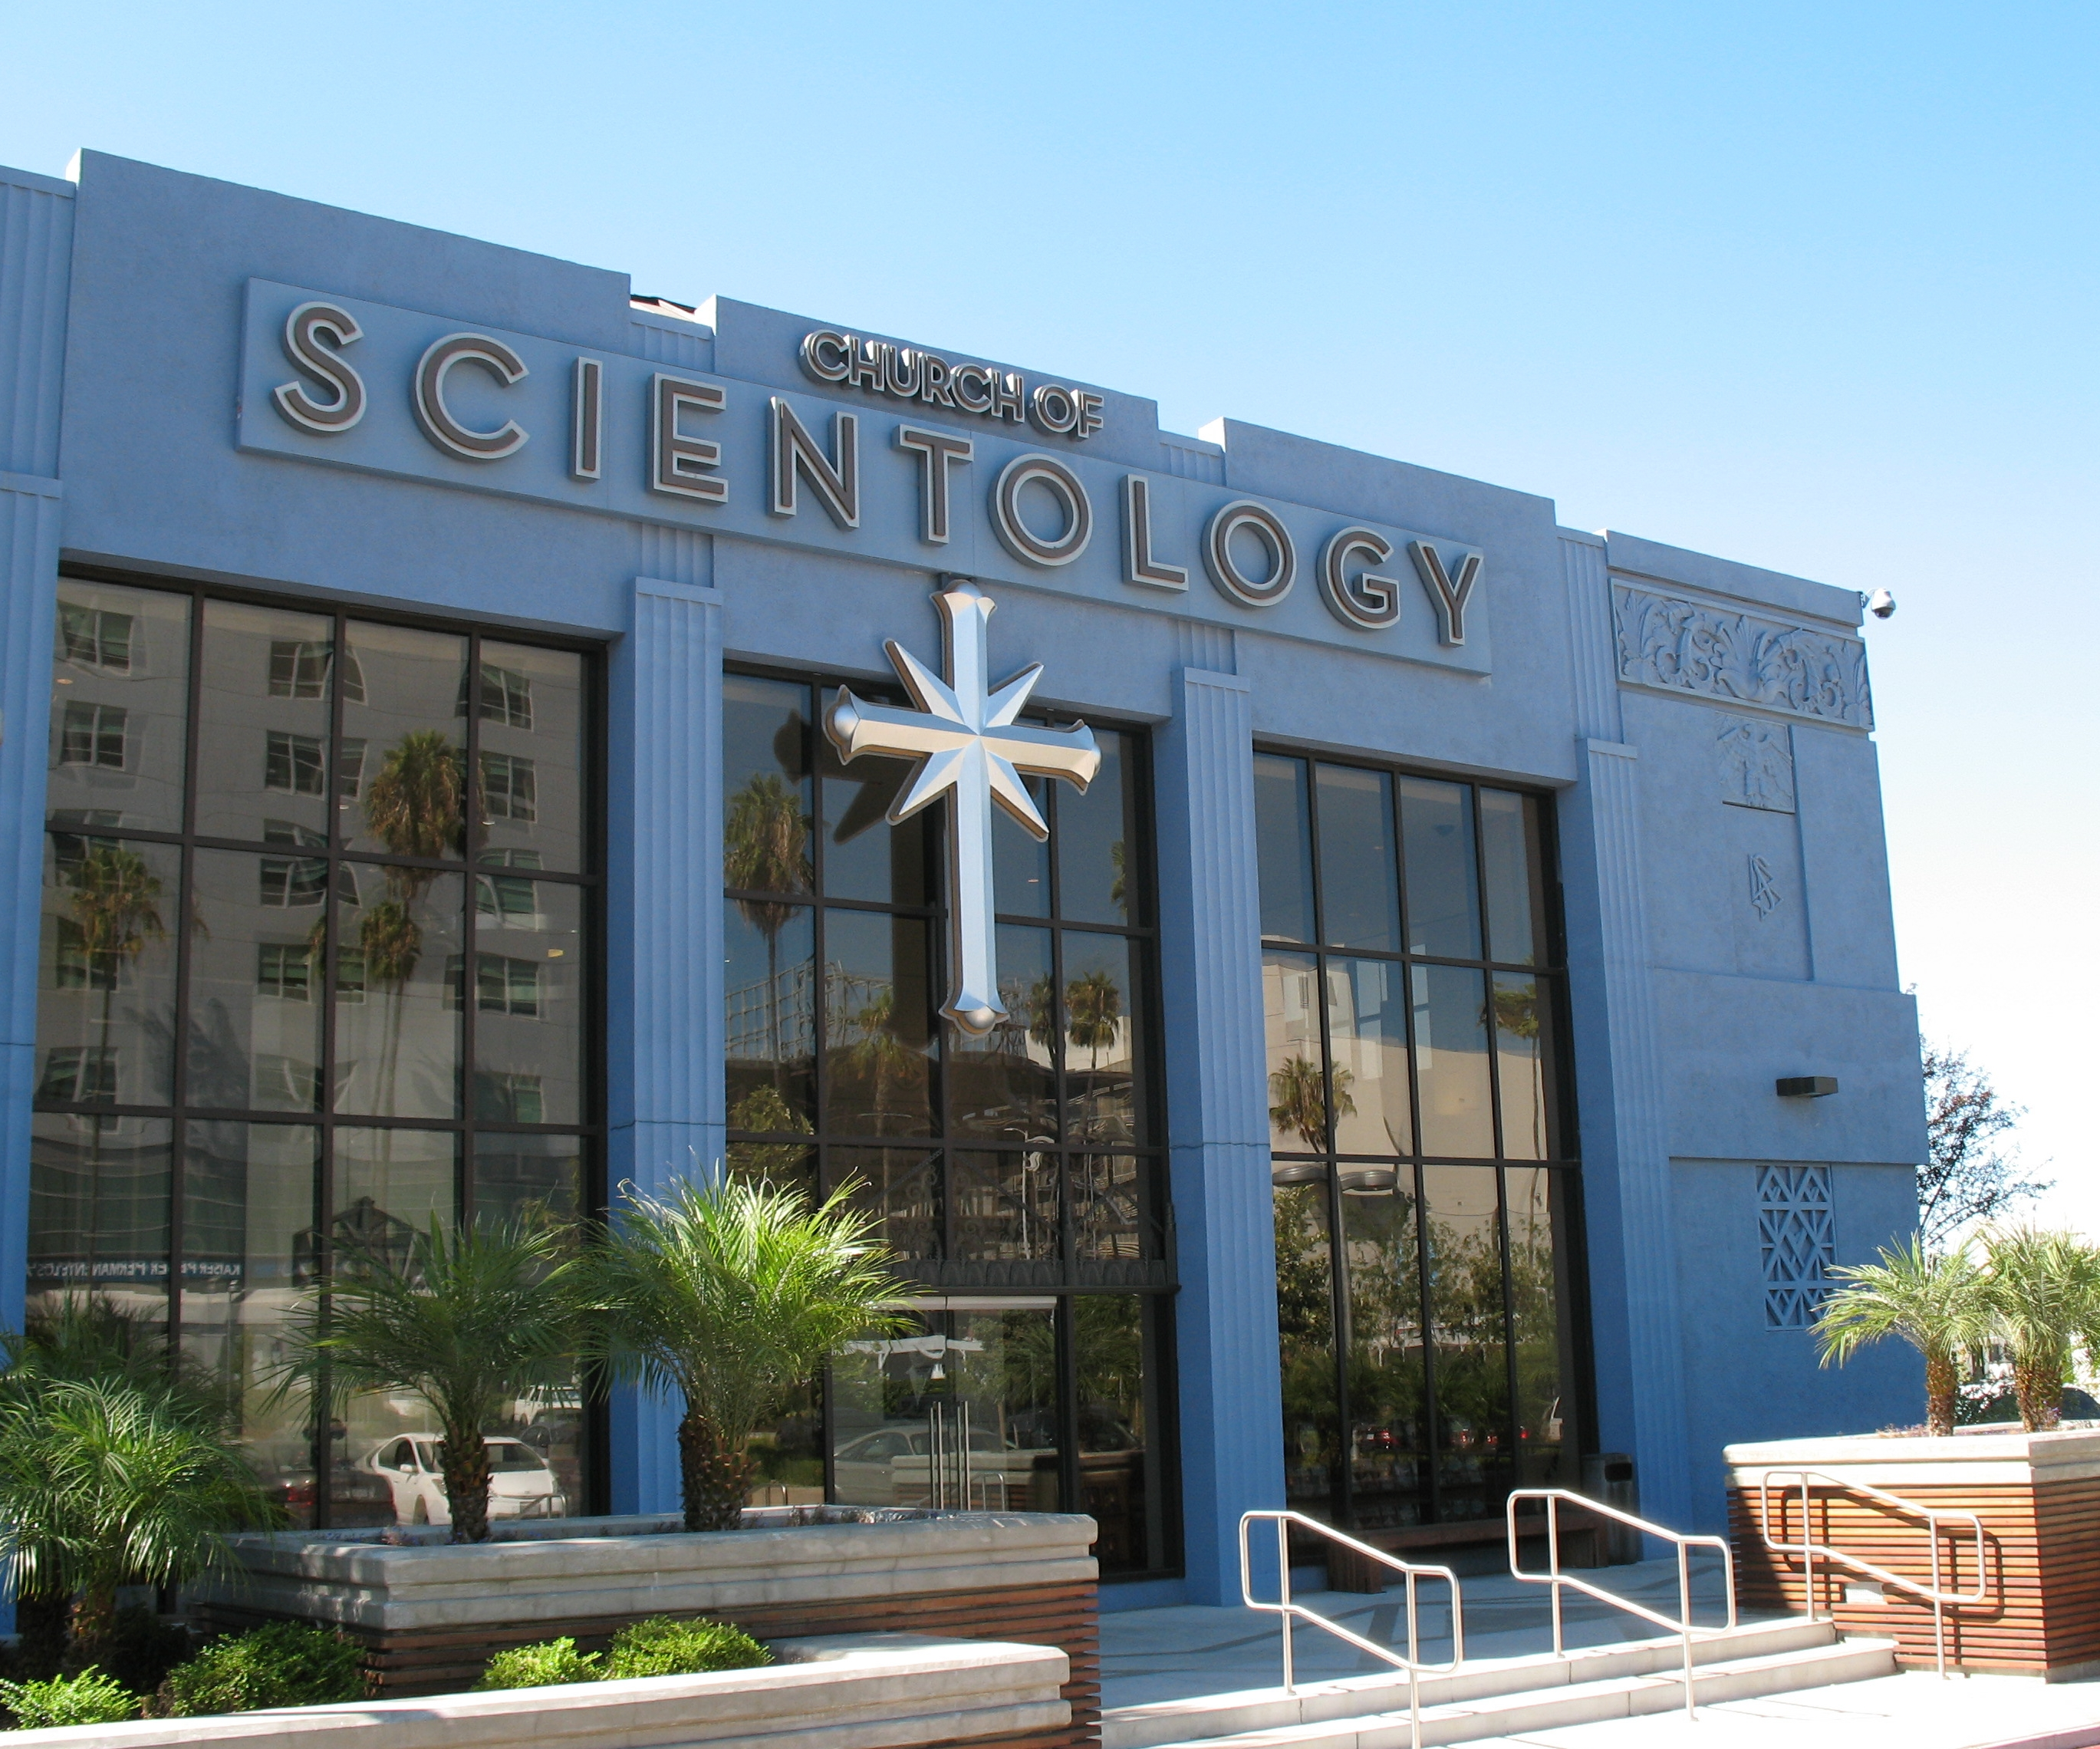 scientology - photo #28